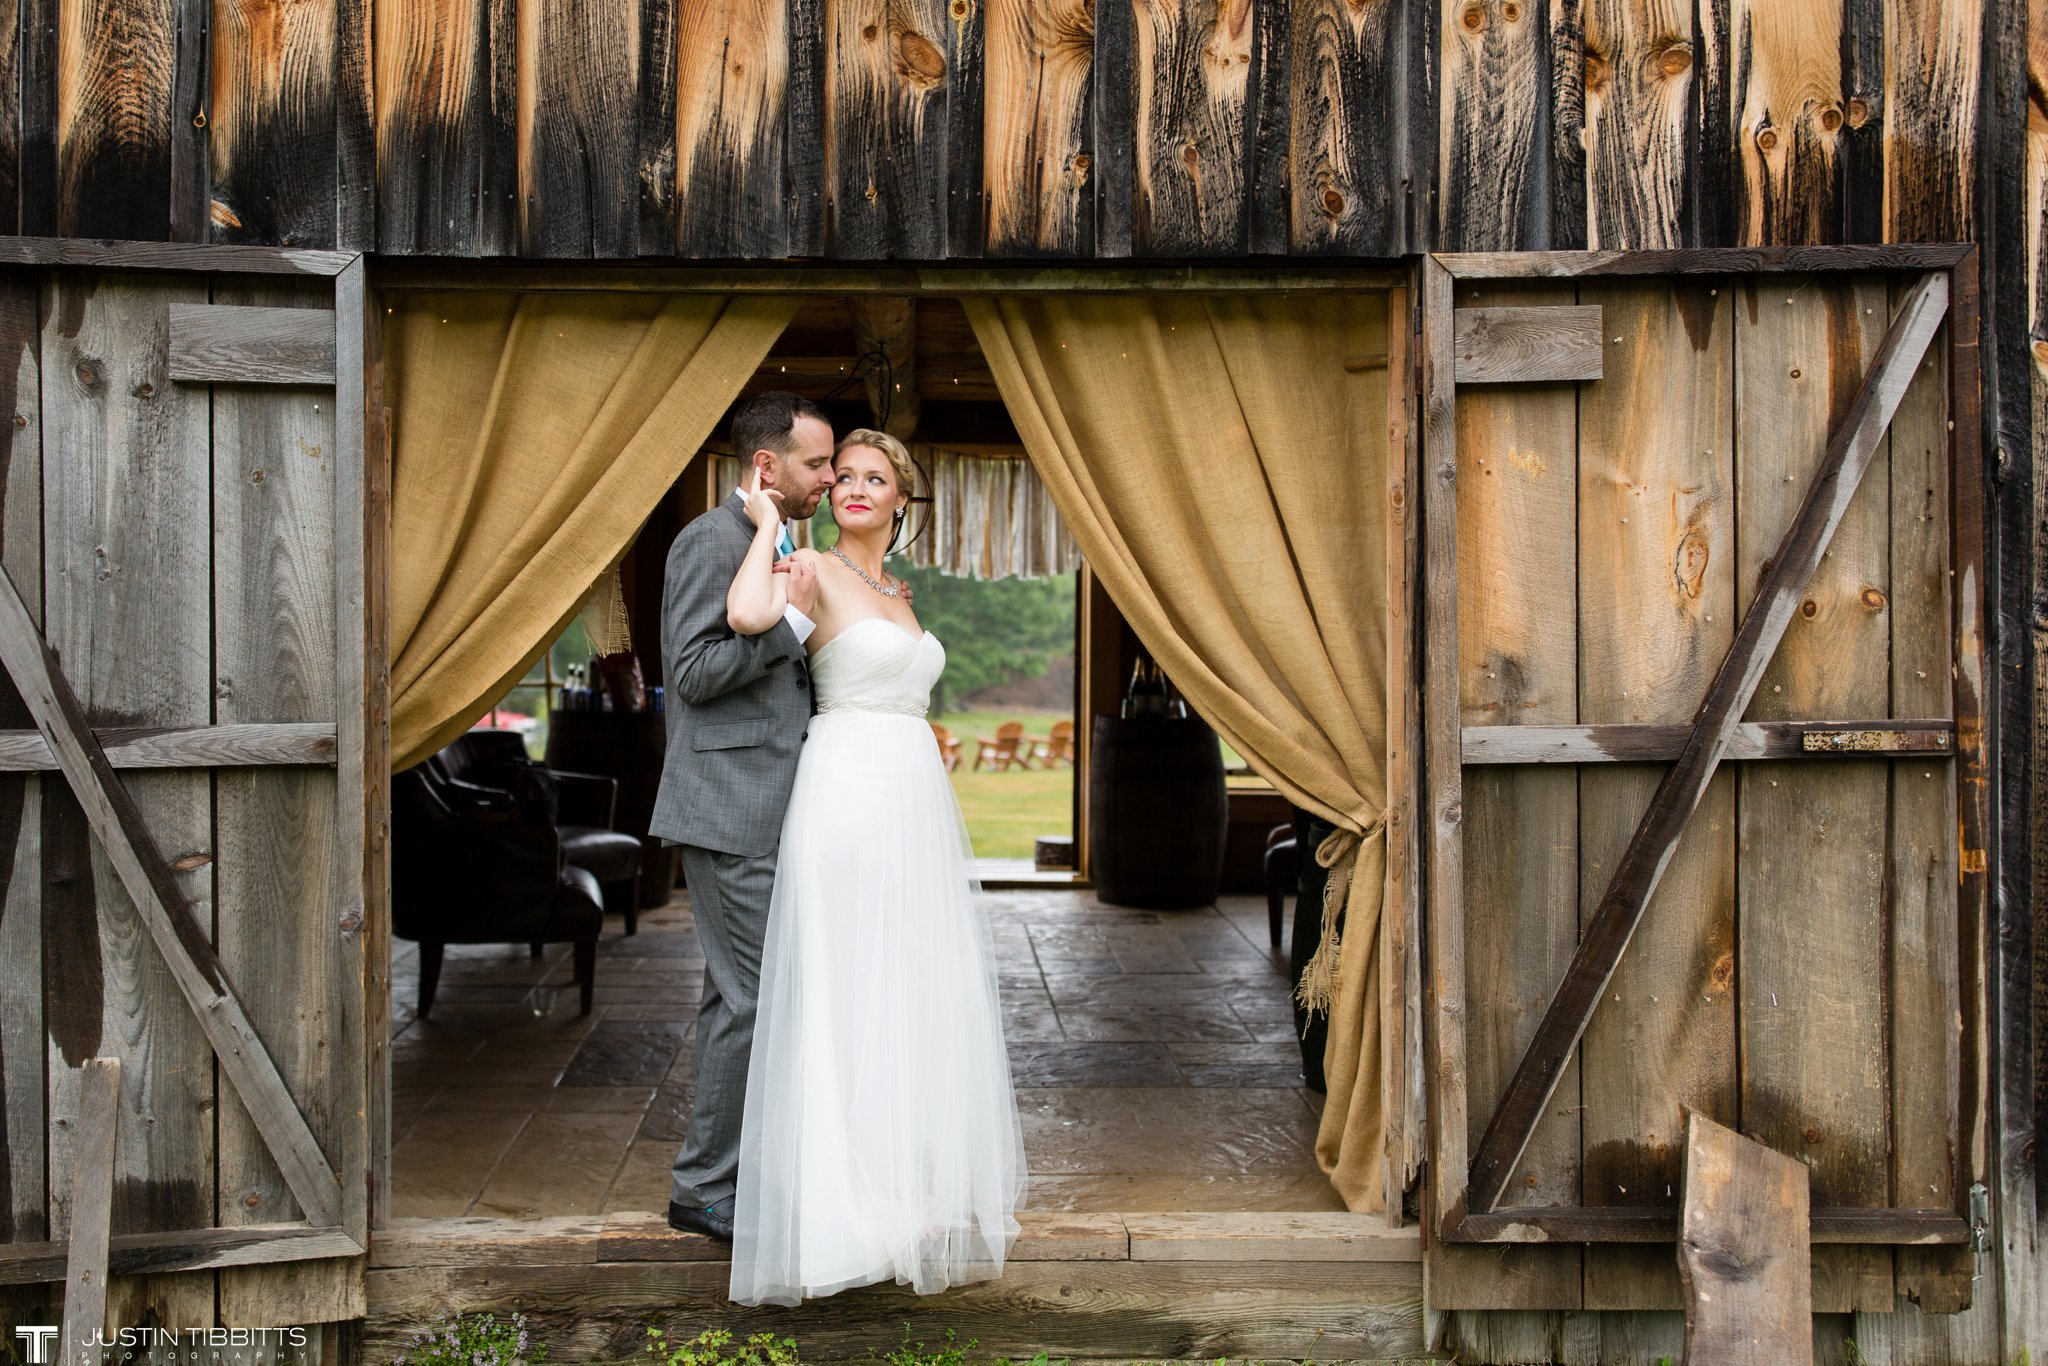 burlap-and-beams-wedding-photos-with-joran-and-molly_0092